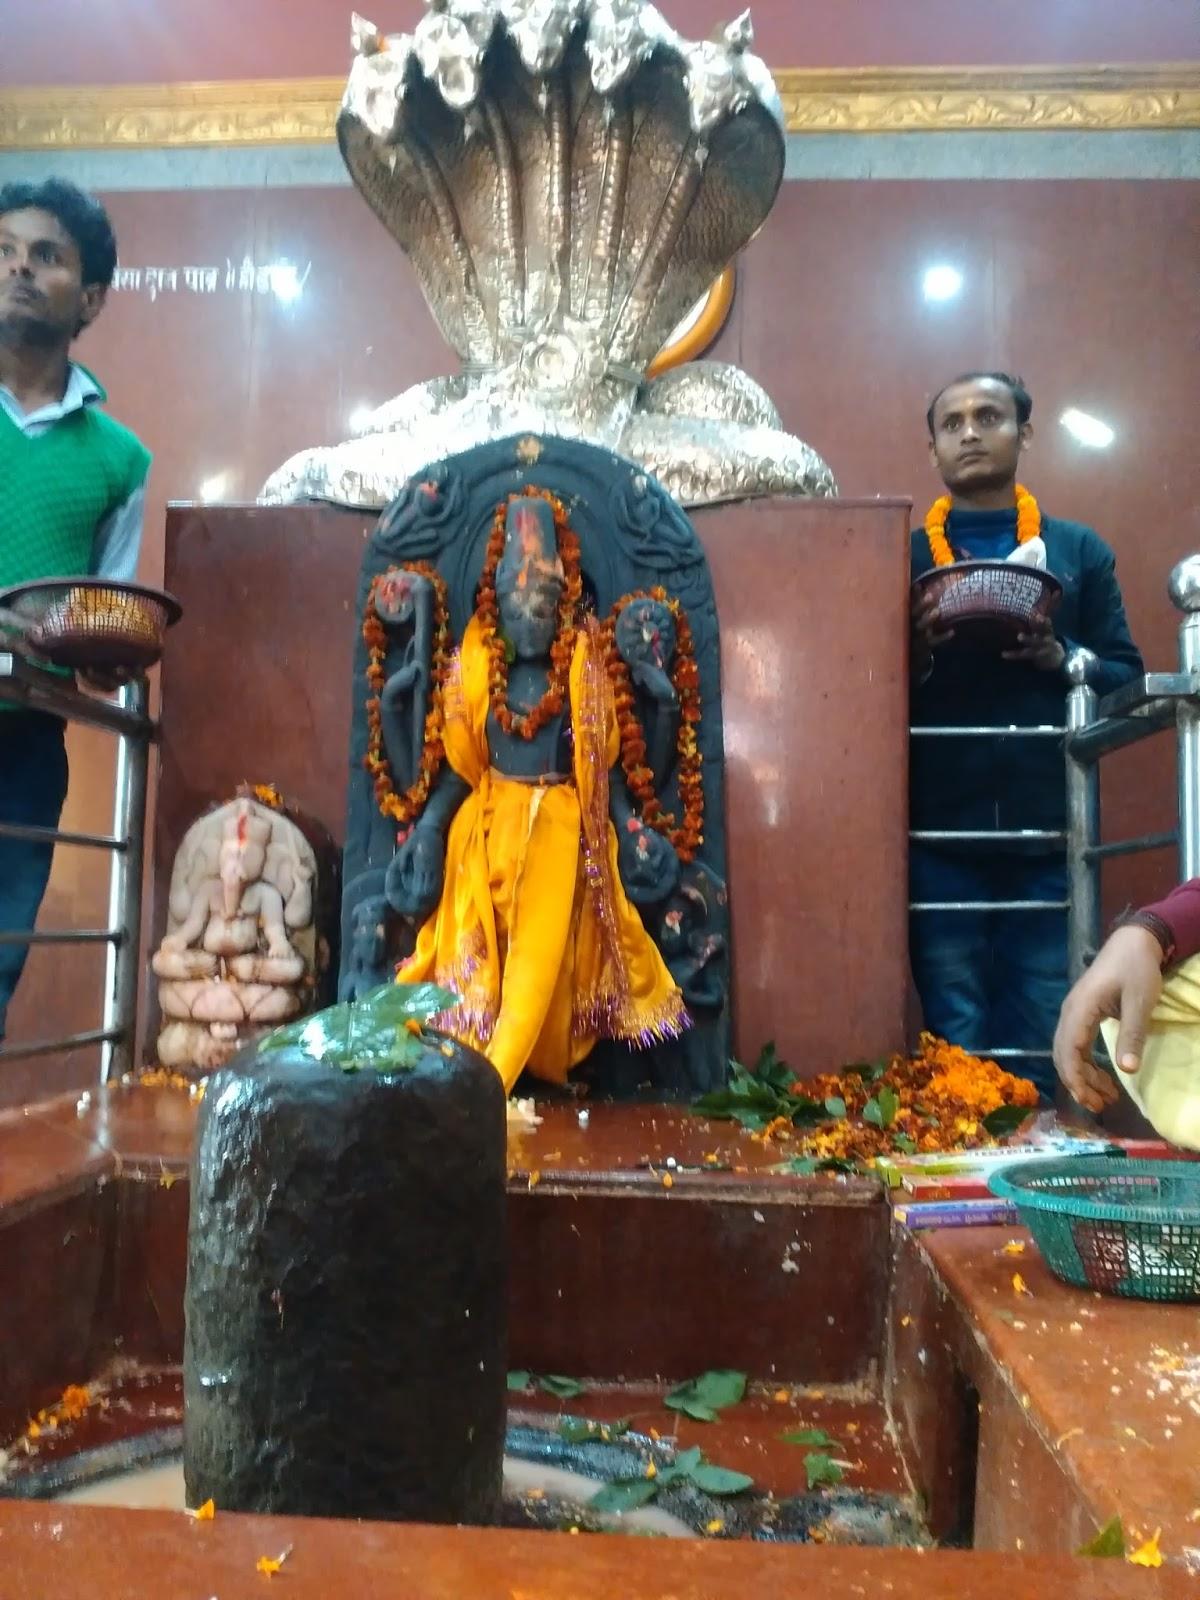 PunjabKesari, Dharam, harihar nath temple, Lord Shiva, Lord Vishnu, sonepur bihar, Sonepur Fair, sonepur fair bihar, कार्तिक मास, भगवान विष्णु, भगवान शंकर, भगवान शिव विष्णु, शिव पूजा, सोनपुर